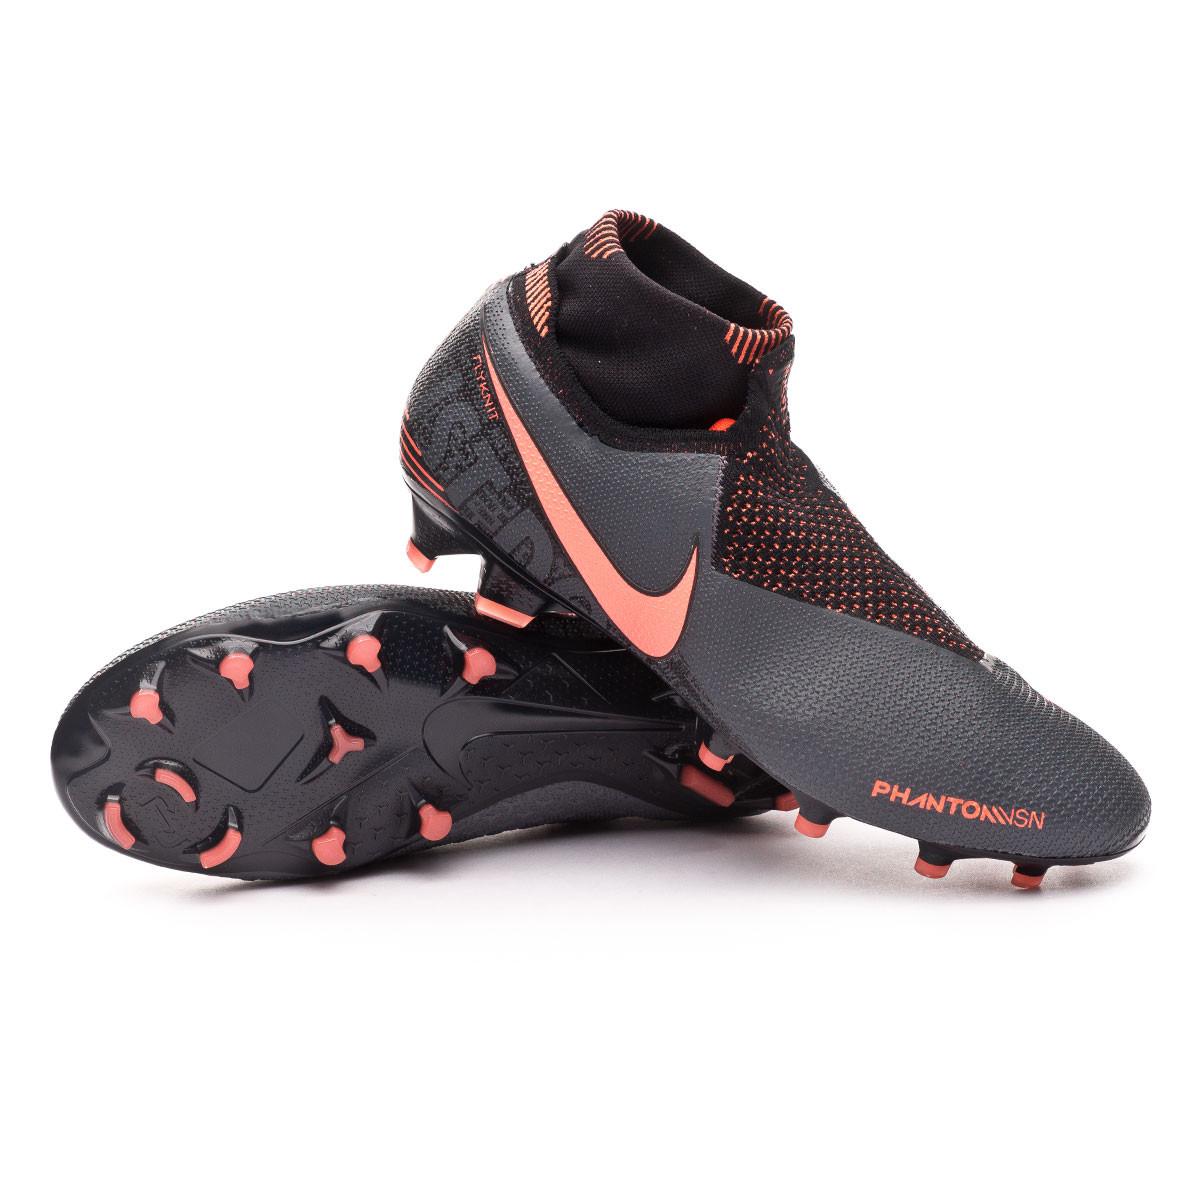 Scarpe Nike Phantom Vision Elite DF FG